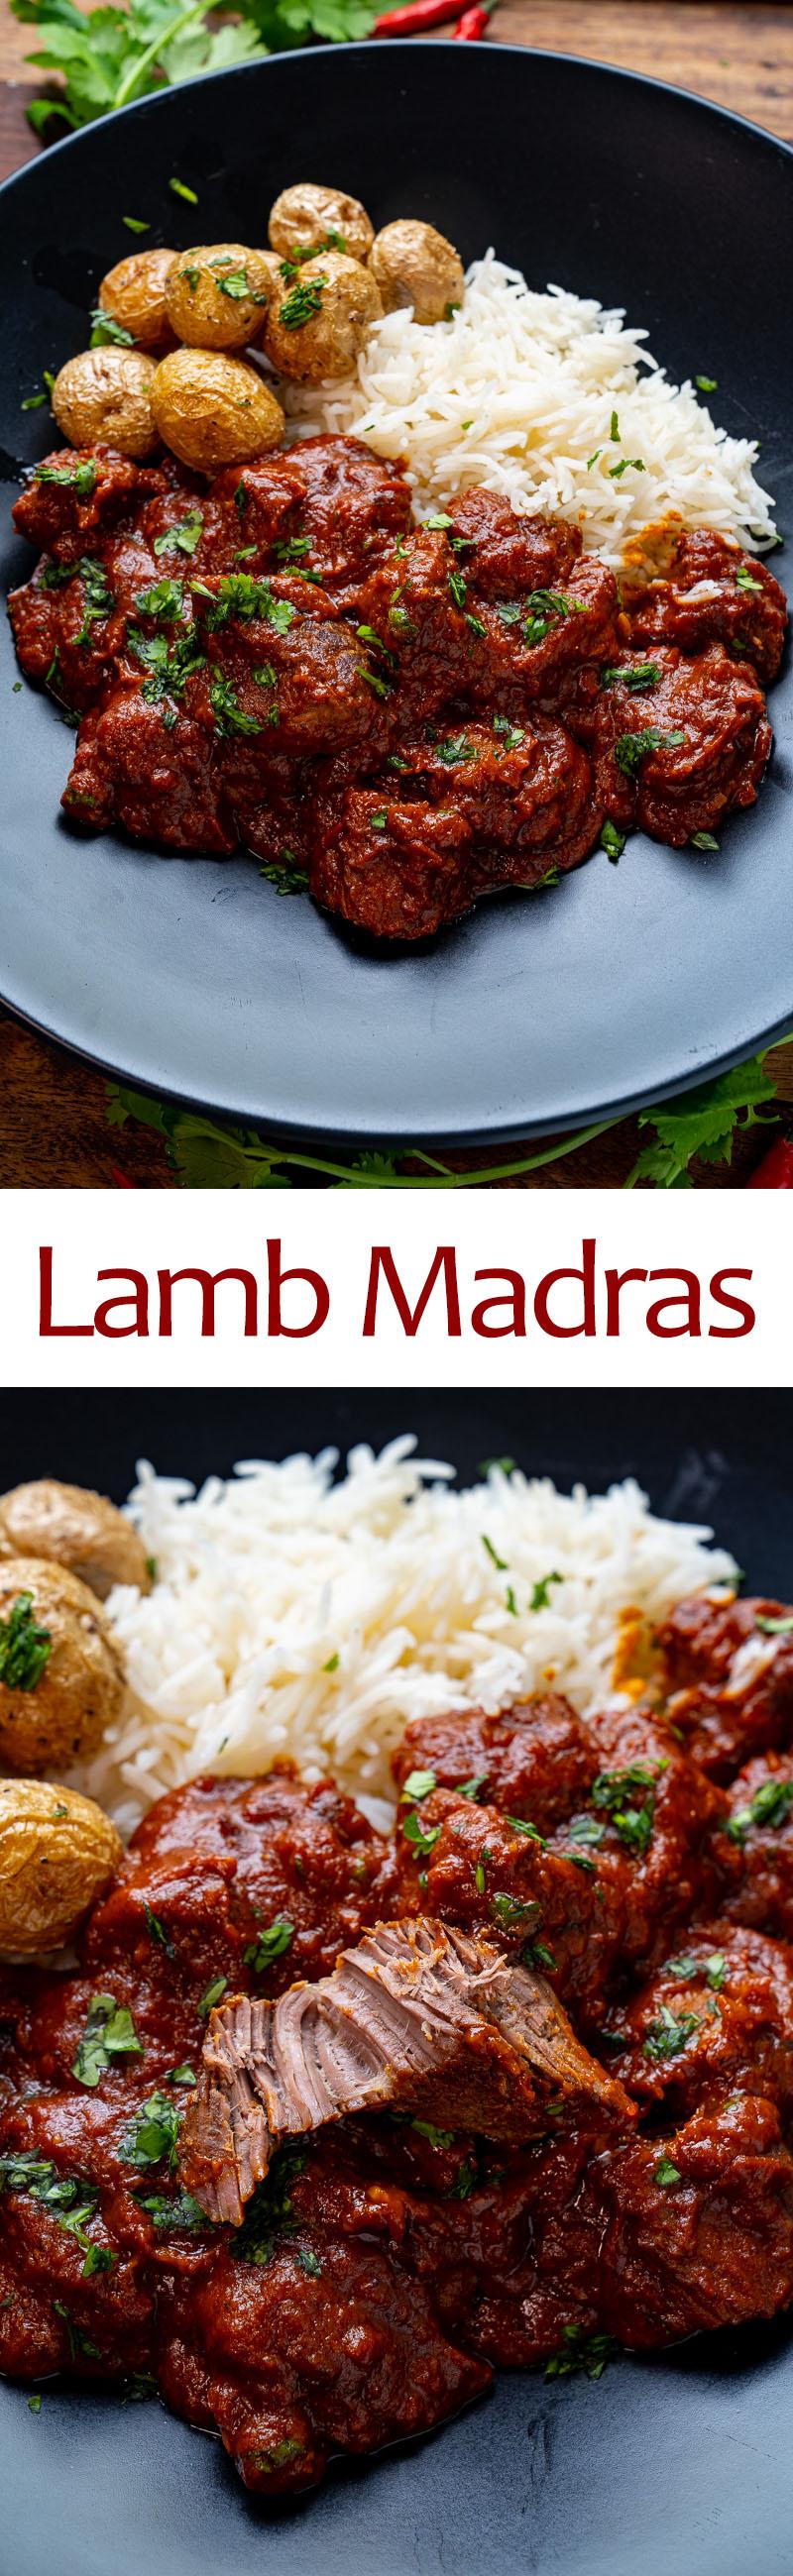 Lamb Madras